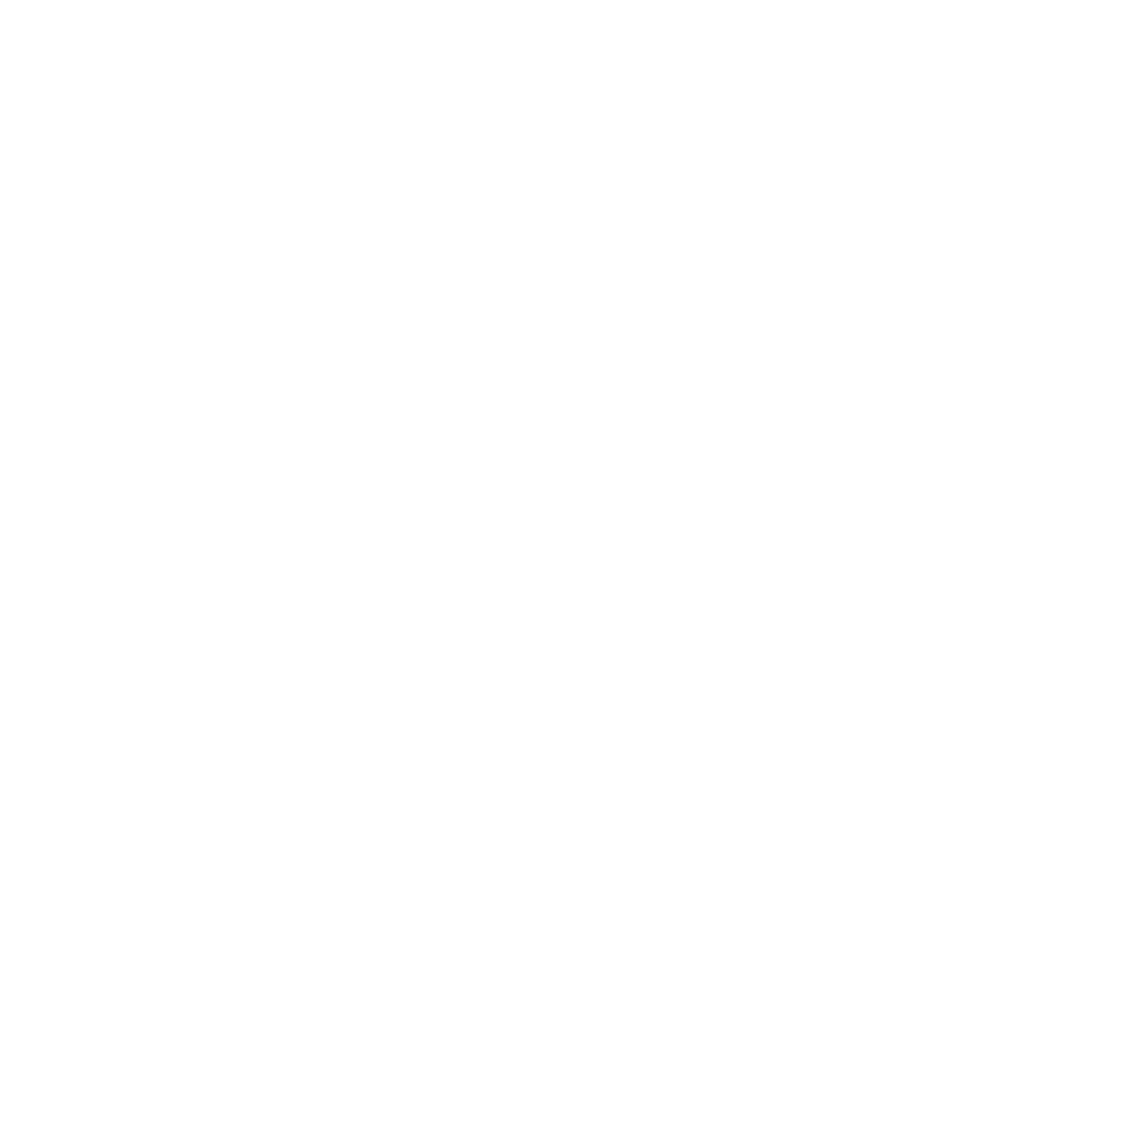 Stark Data Chain